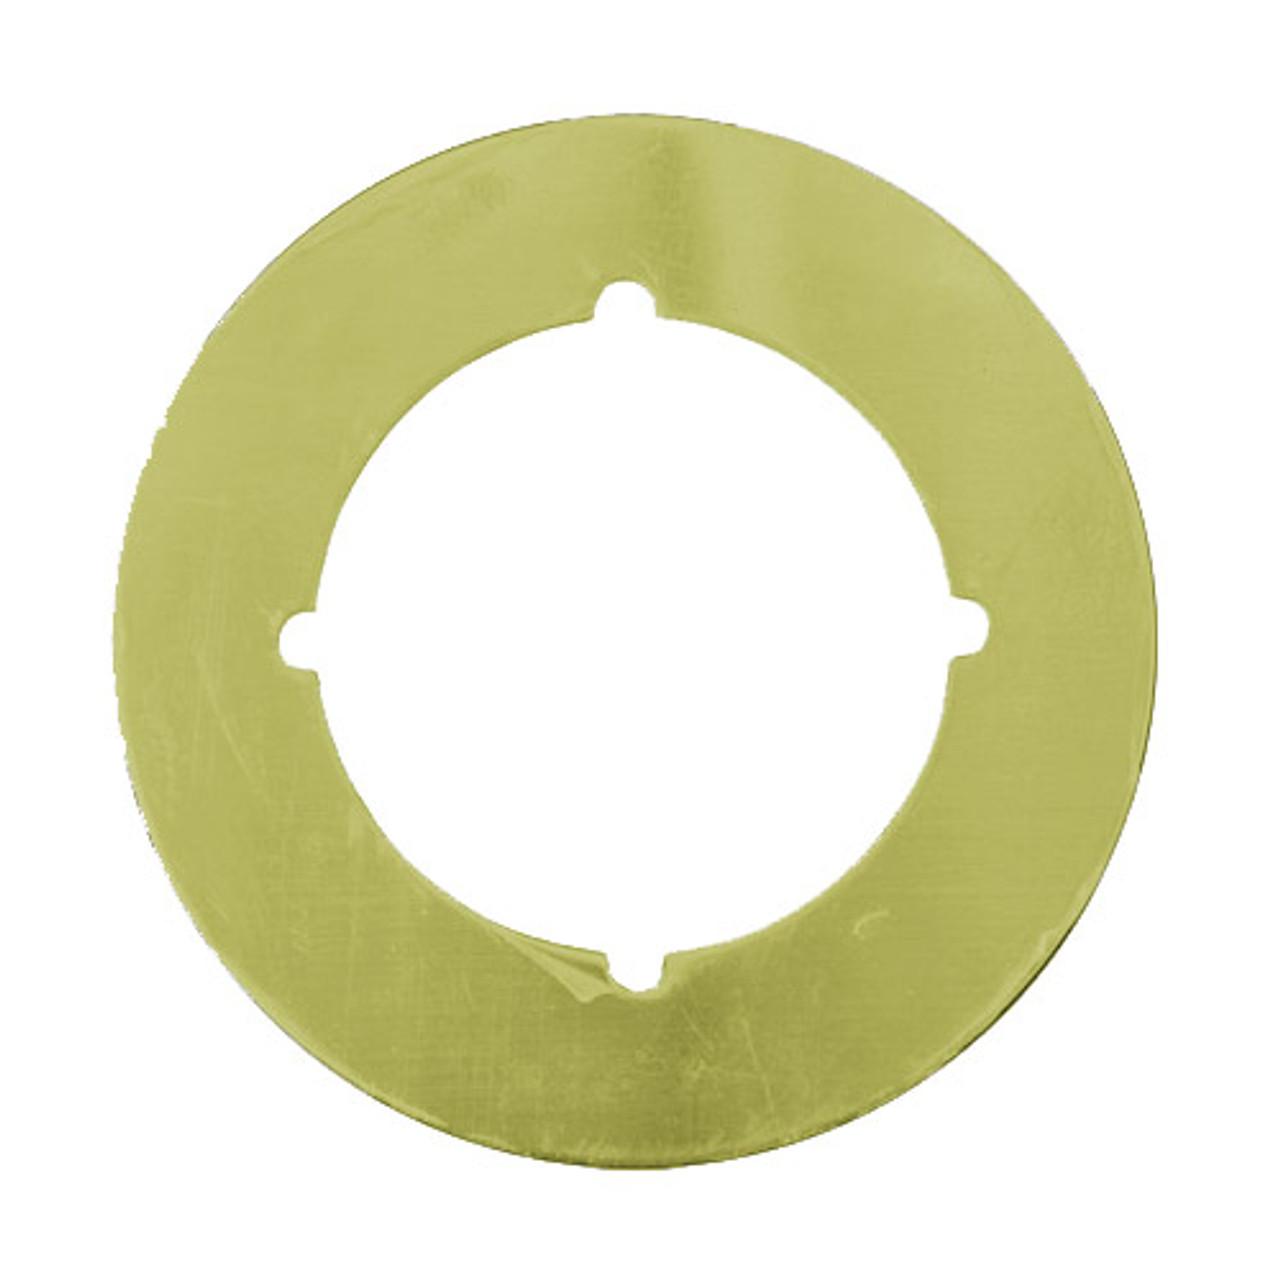 PBSP-135-605 Don Jo Scar Plate in Bright Brass Finish